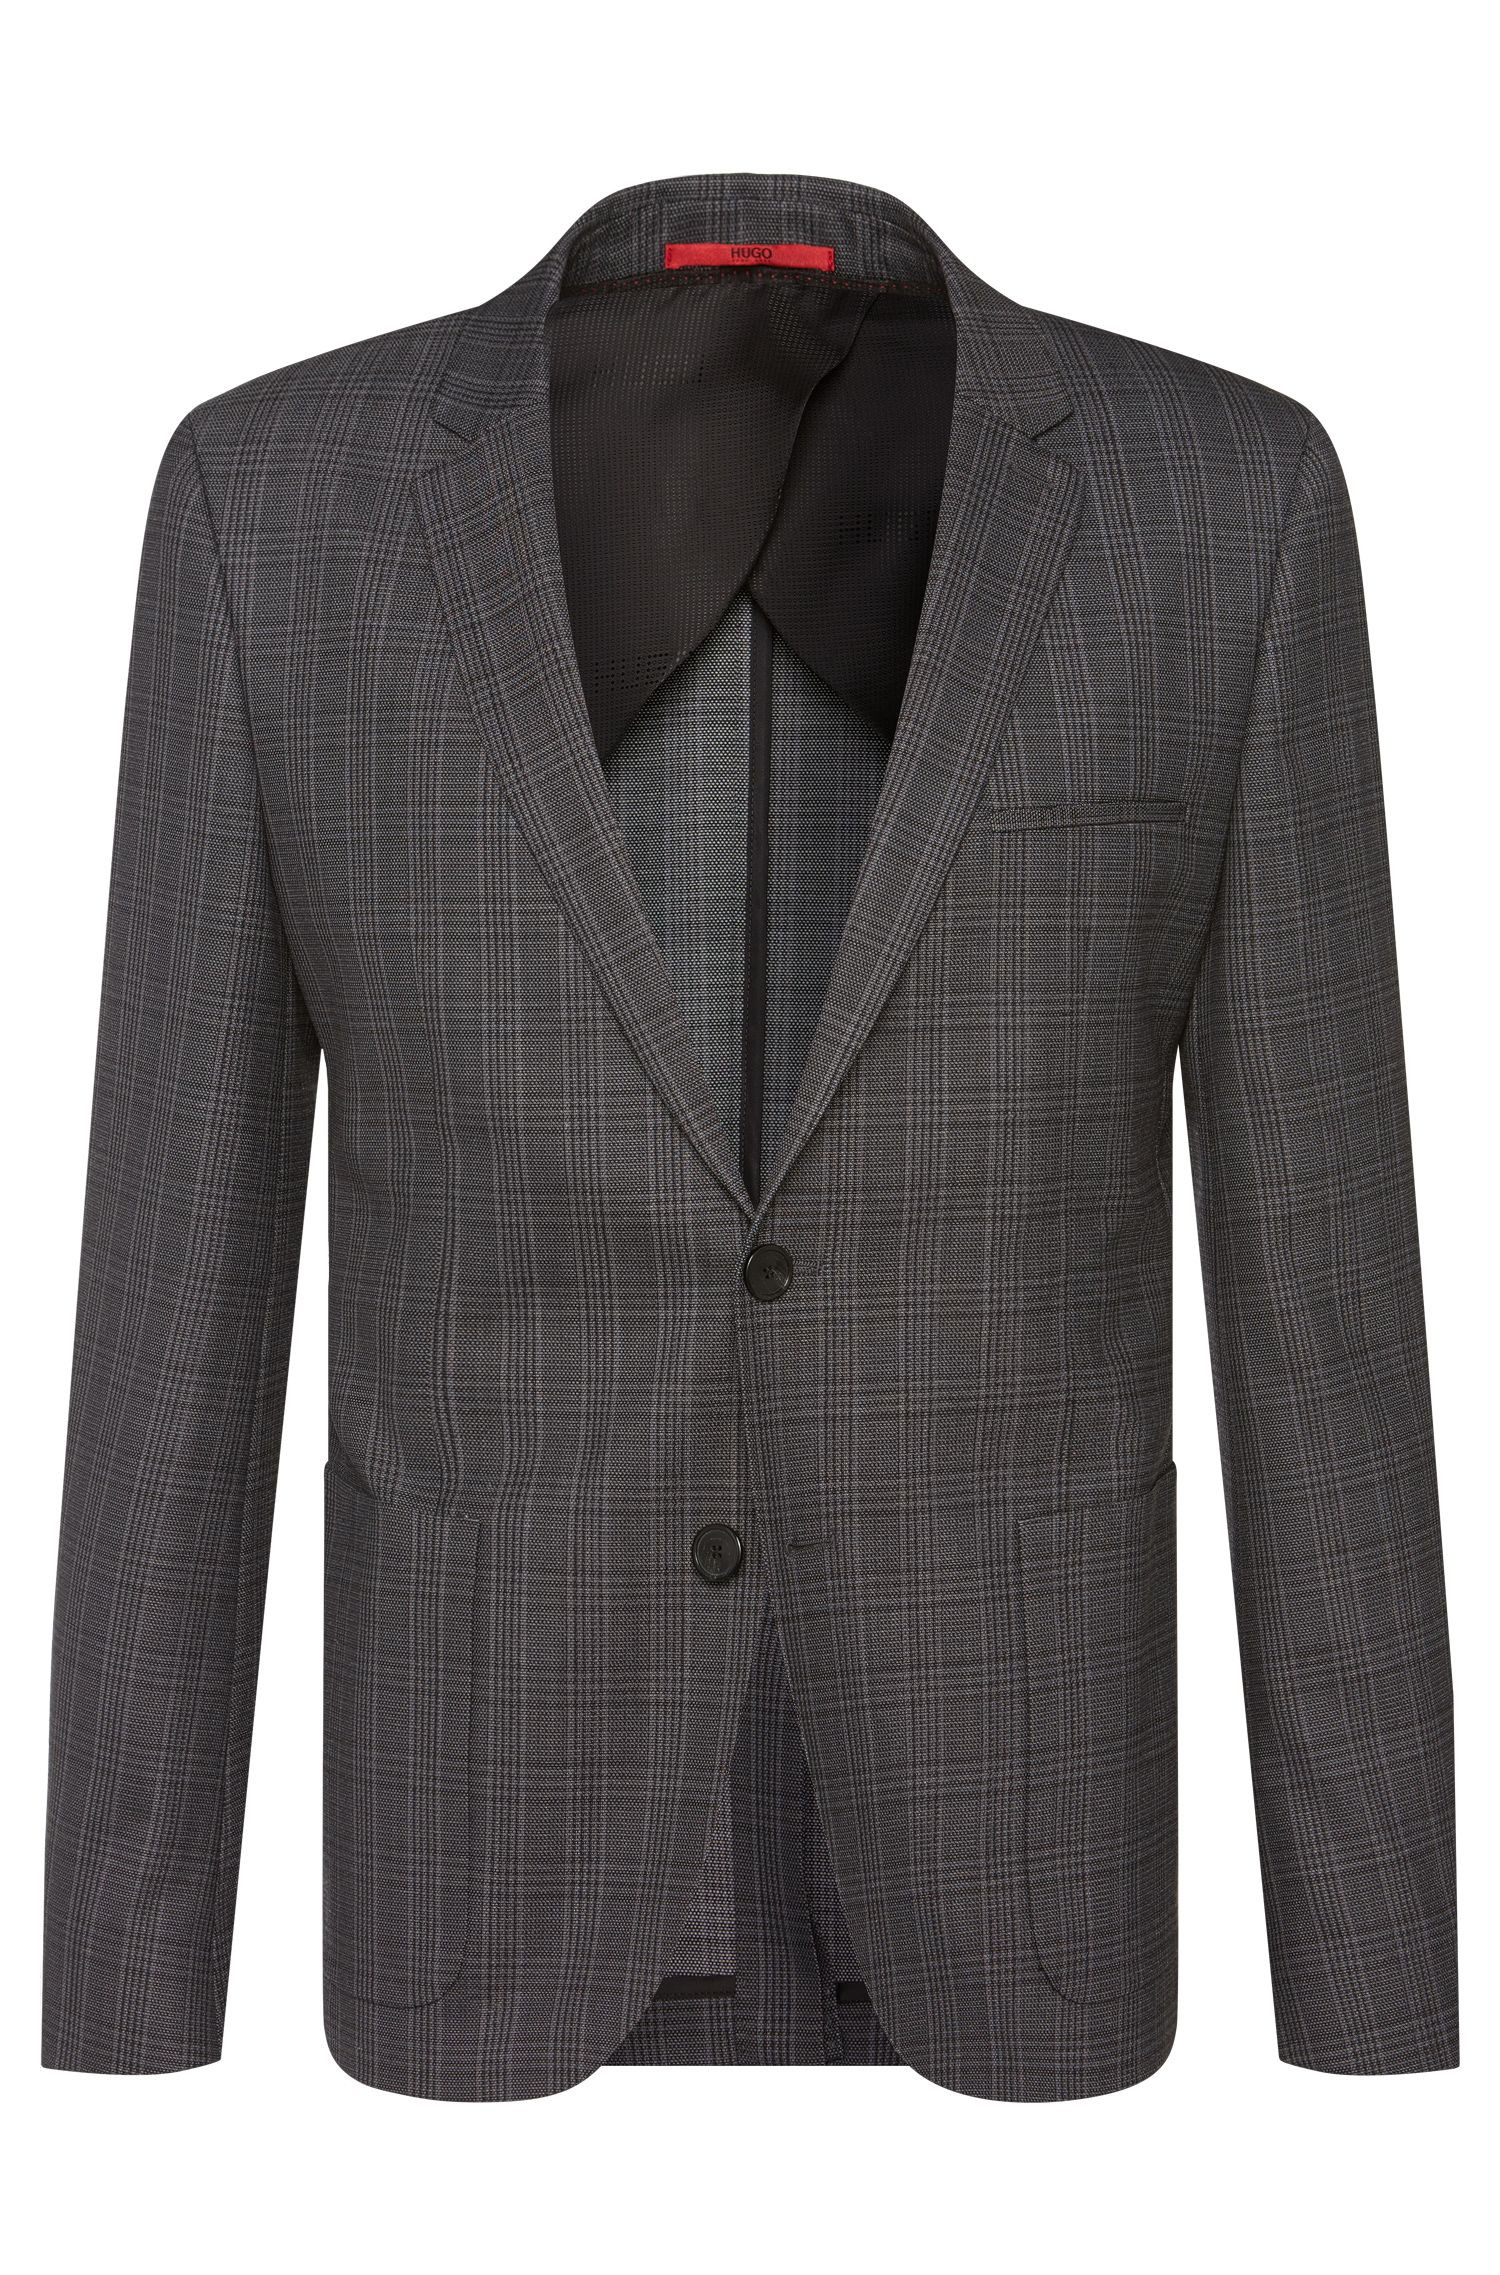 'Antano' | Slim Fit, Stretch Virgin Wool Blend Sport Coat